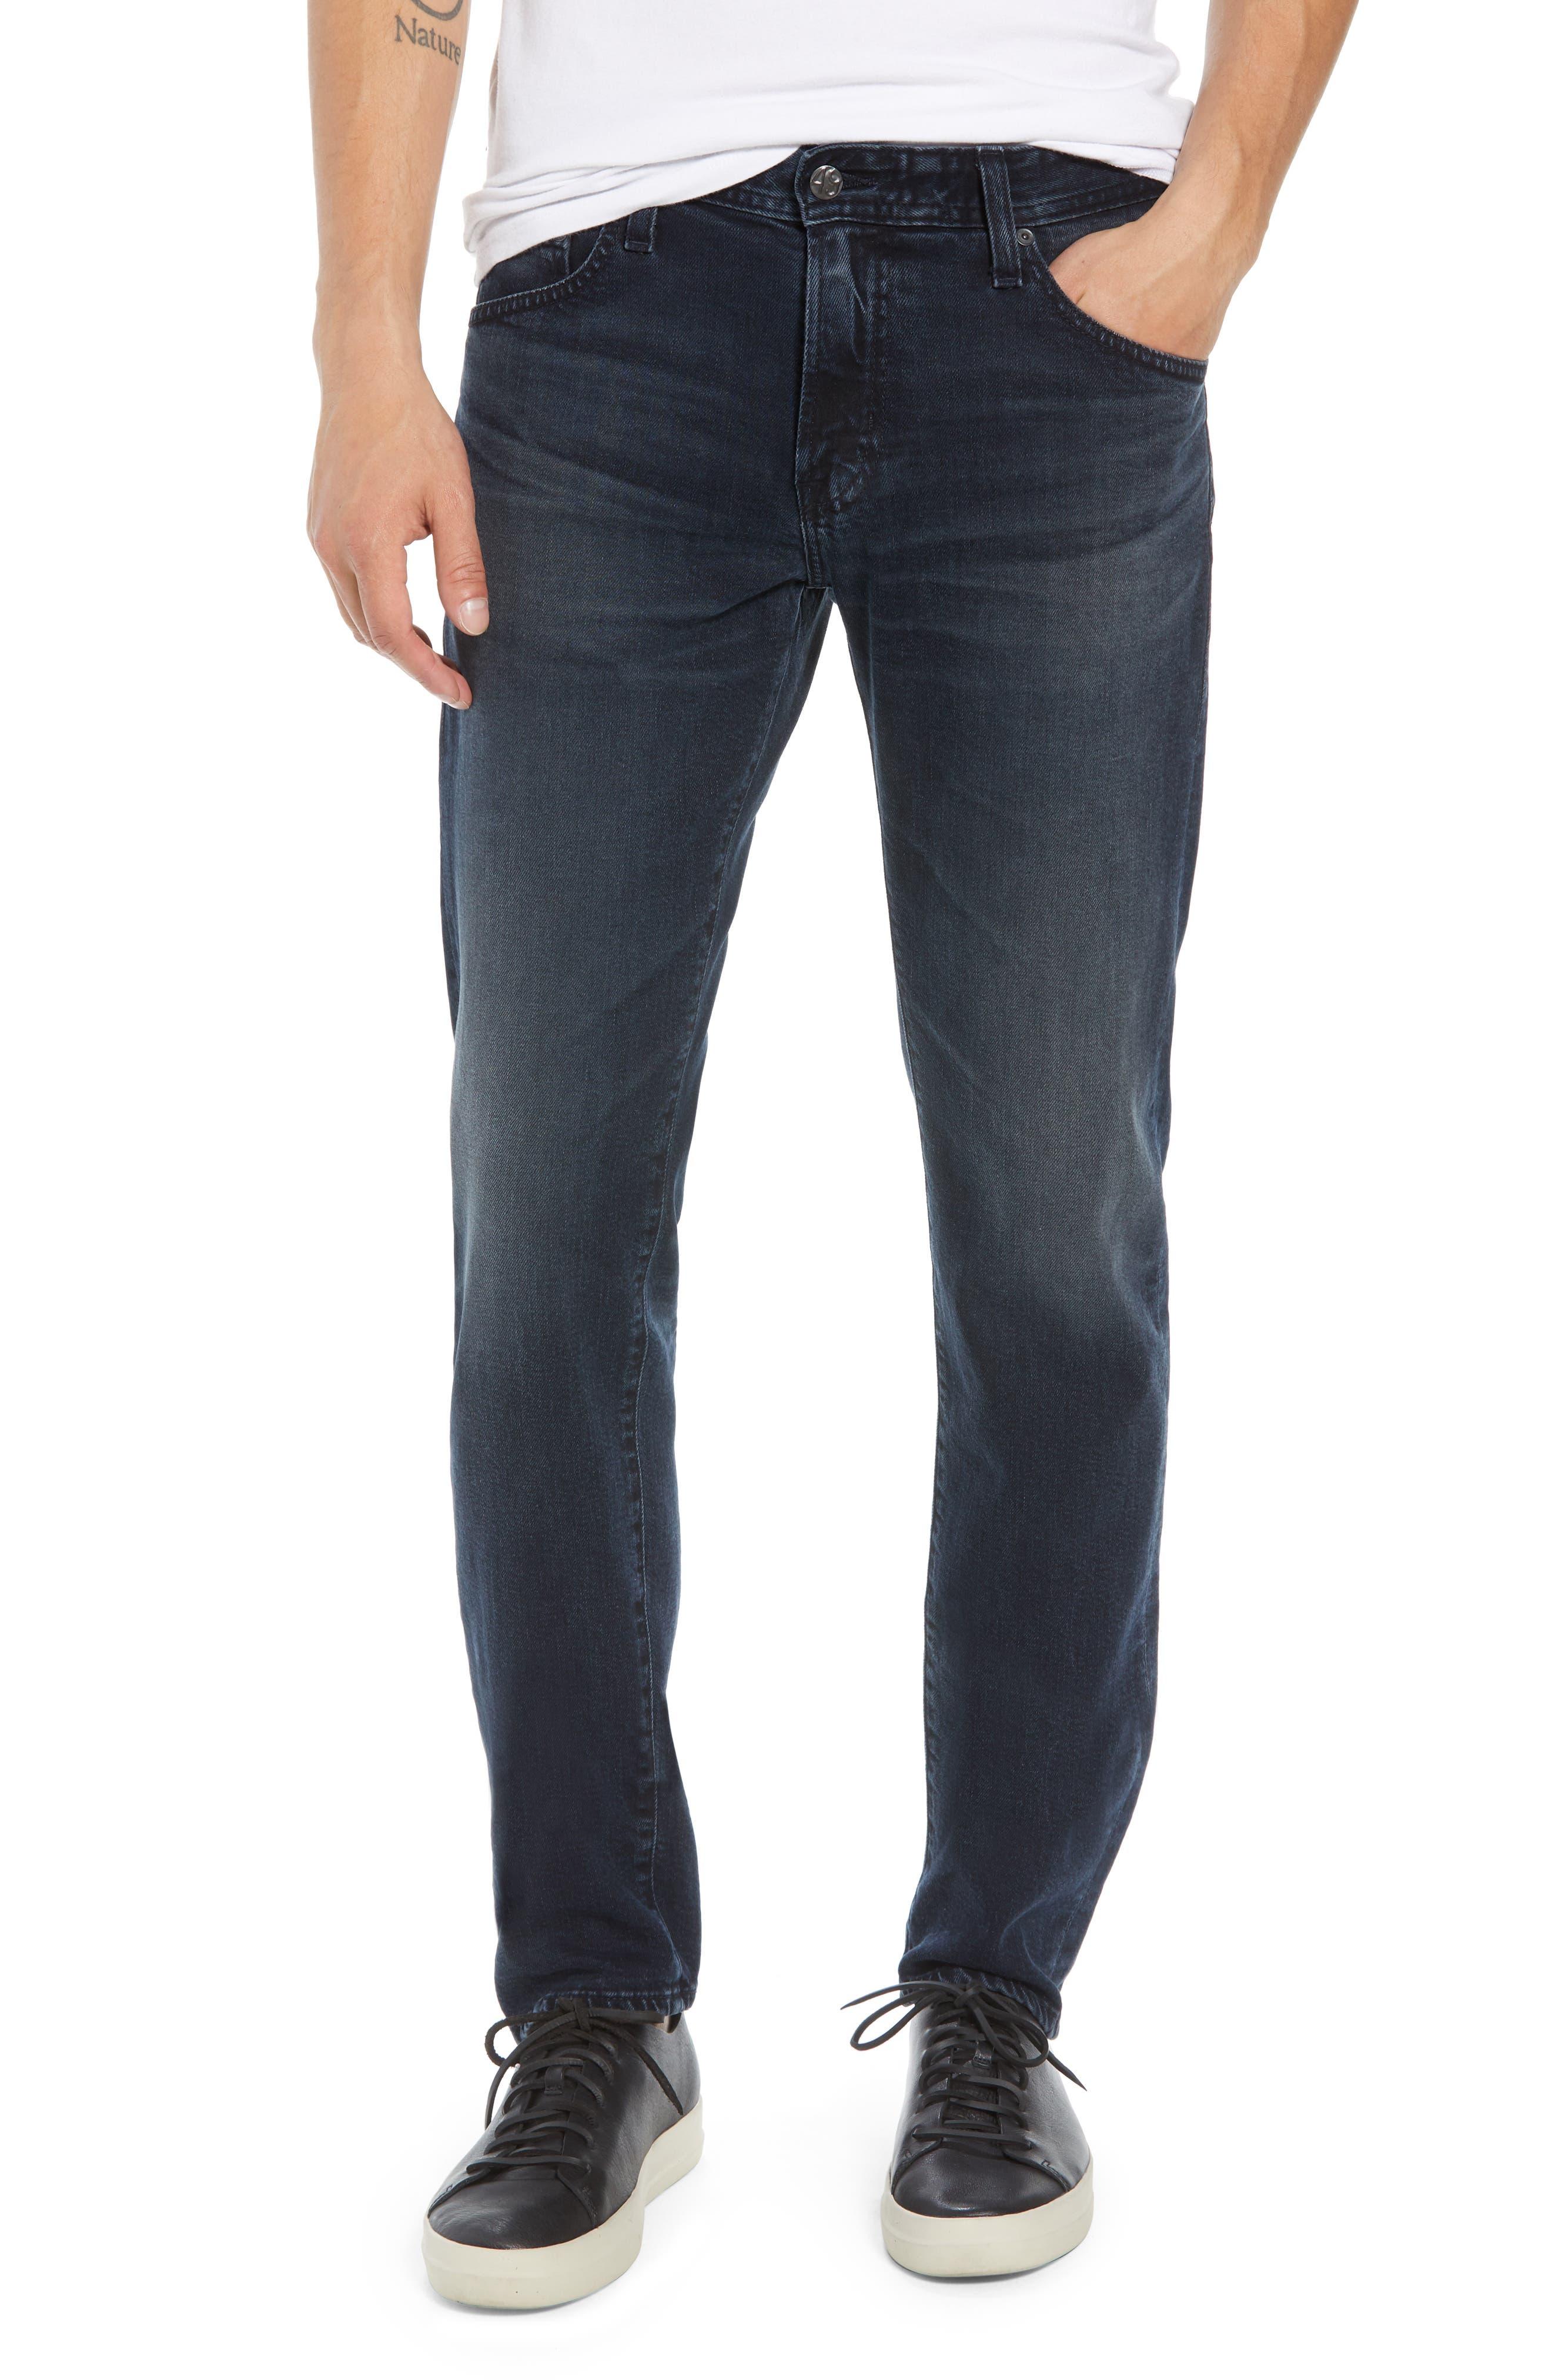 Tellis Slim Fit Jeans,                             Main thumbnail 1, color,                             2 YEARS RUMBLE